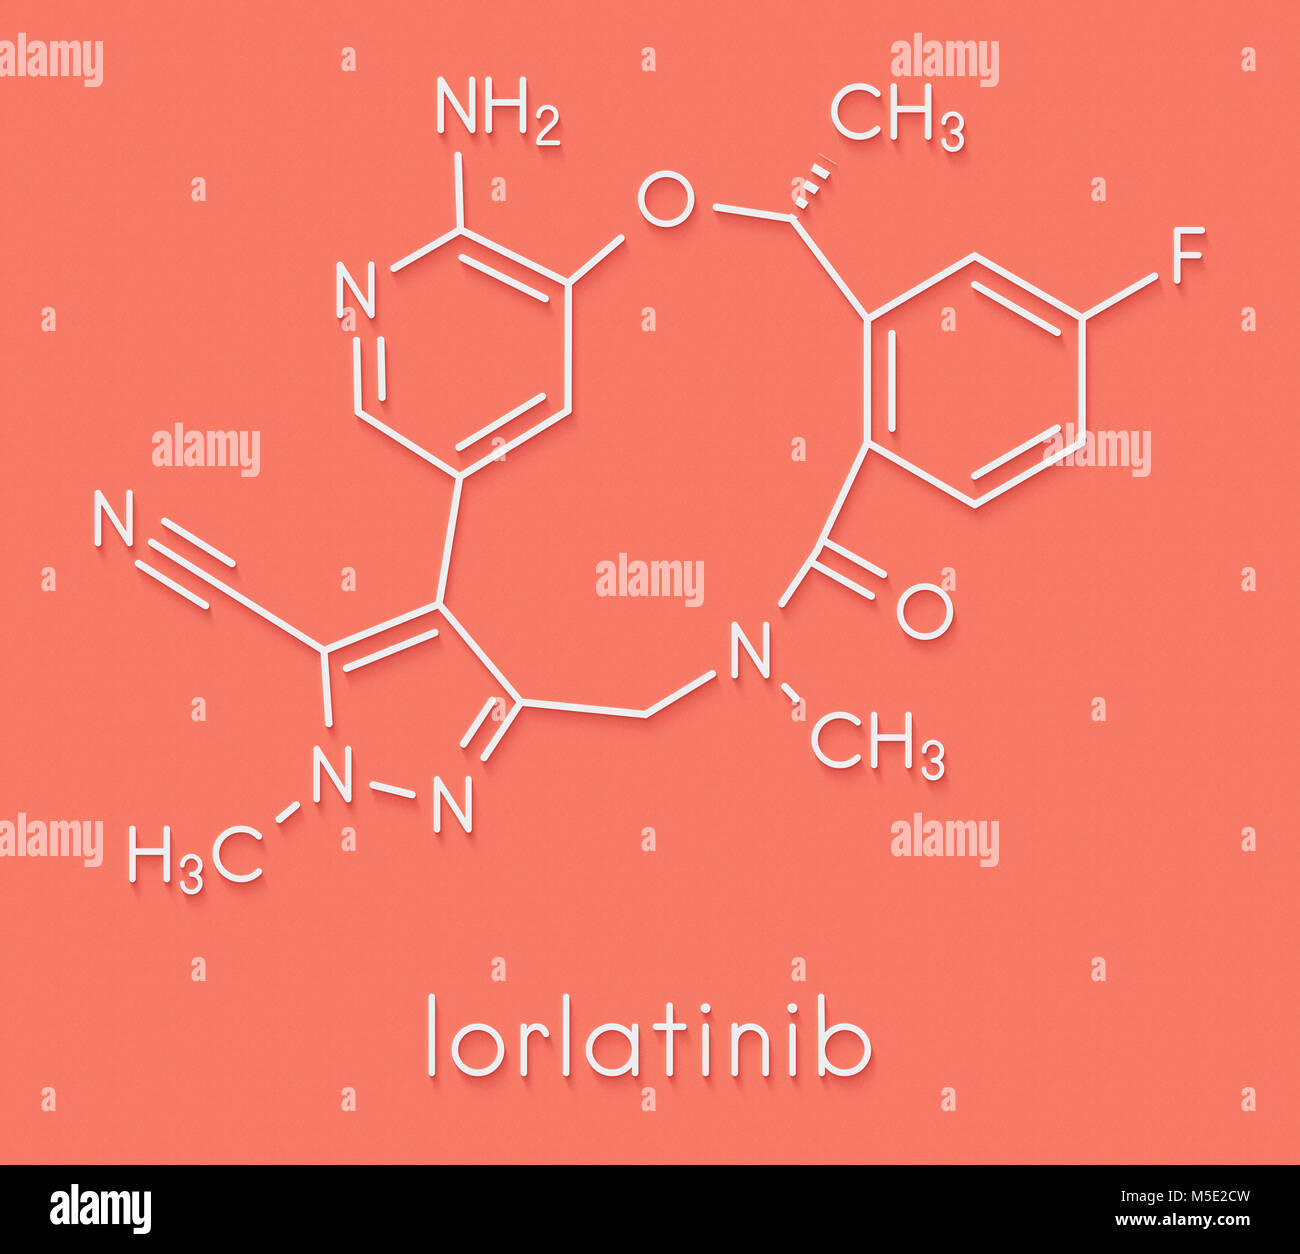 Lorlatinib cancer drug molecule. Skeletal formula. - Stock Image